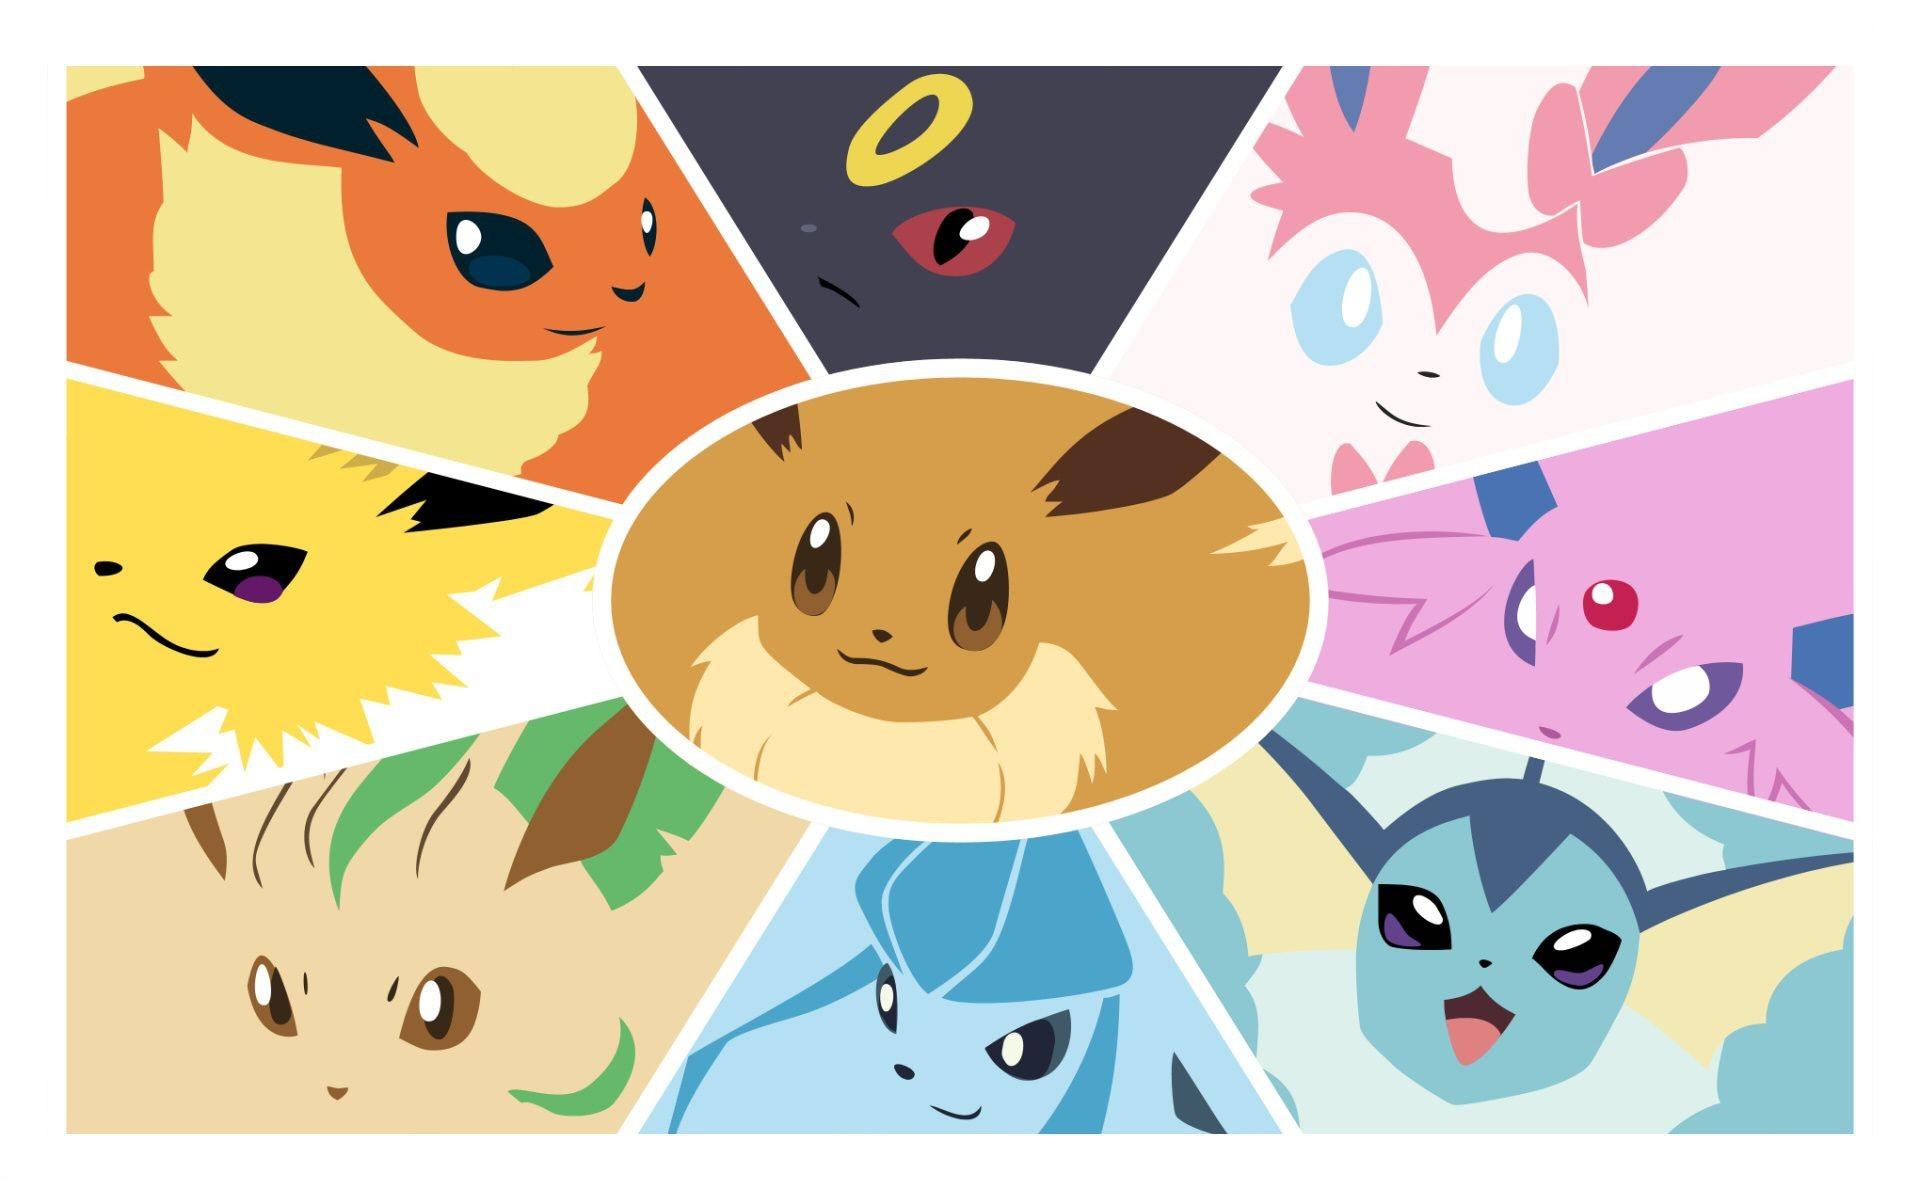 Res: 1920x1200, Cute Pokemon Wallpaper Eevee Free Download Pokemon Phone Eevee Wallpapers  Page 3 Of 3 Of Cute